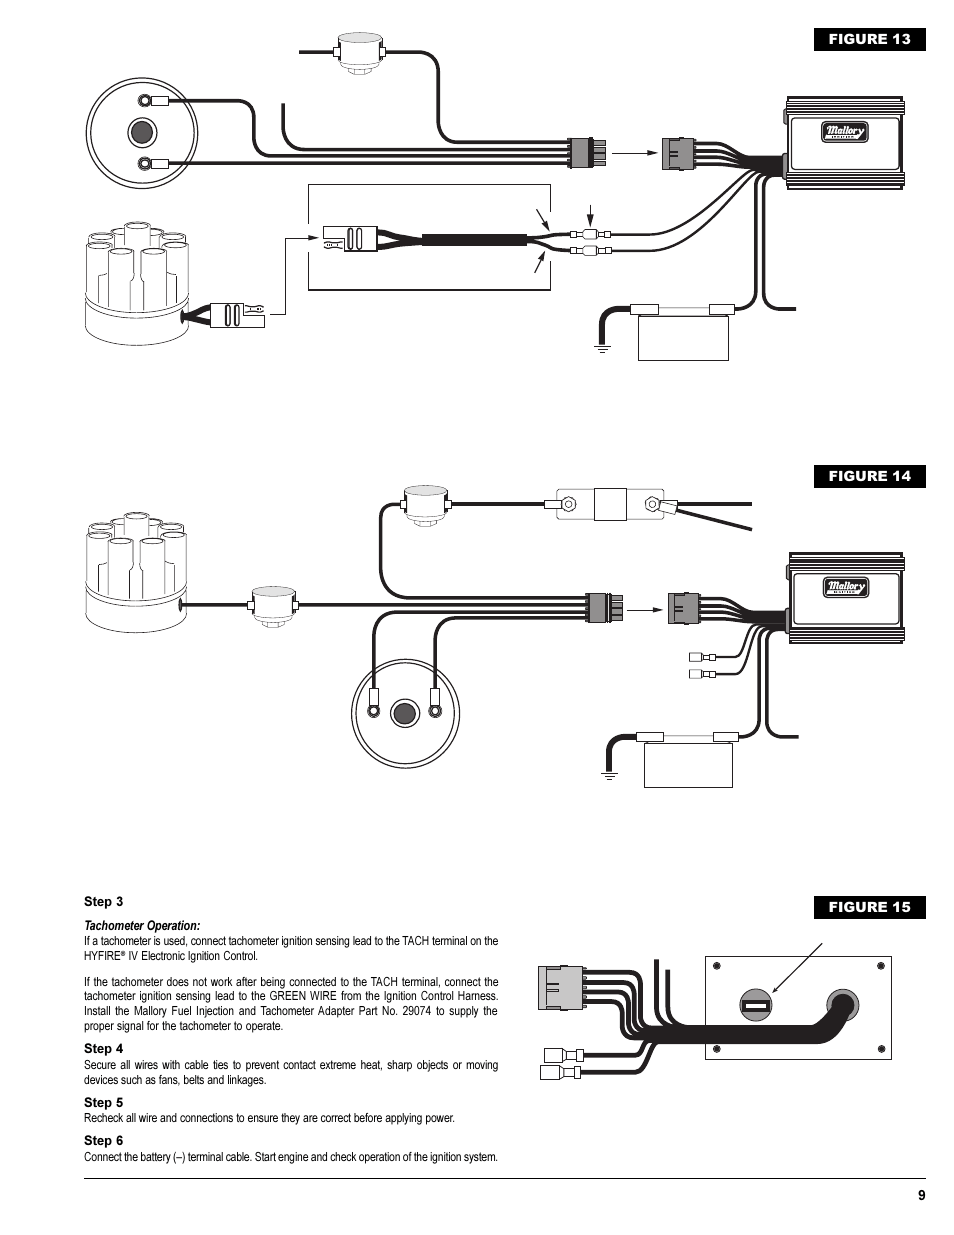 Mallory 8548201 Hei Wiring Diagram Trusted Schematics 5048201 Inspiring Hyfire Septic Field Gm Distributor